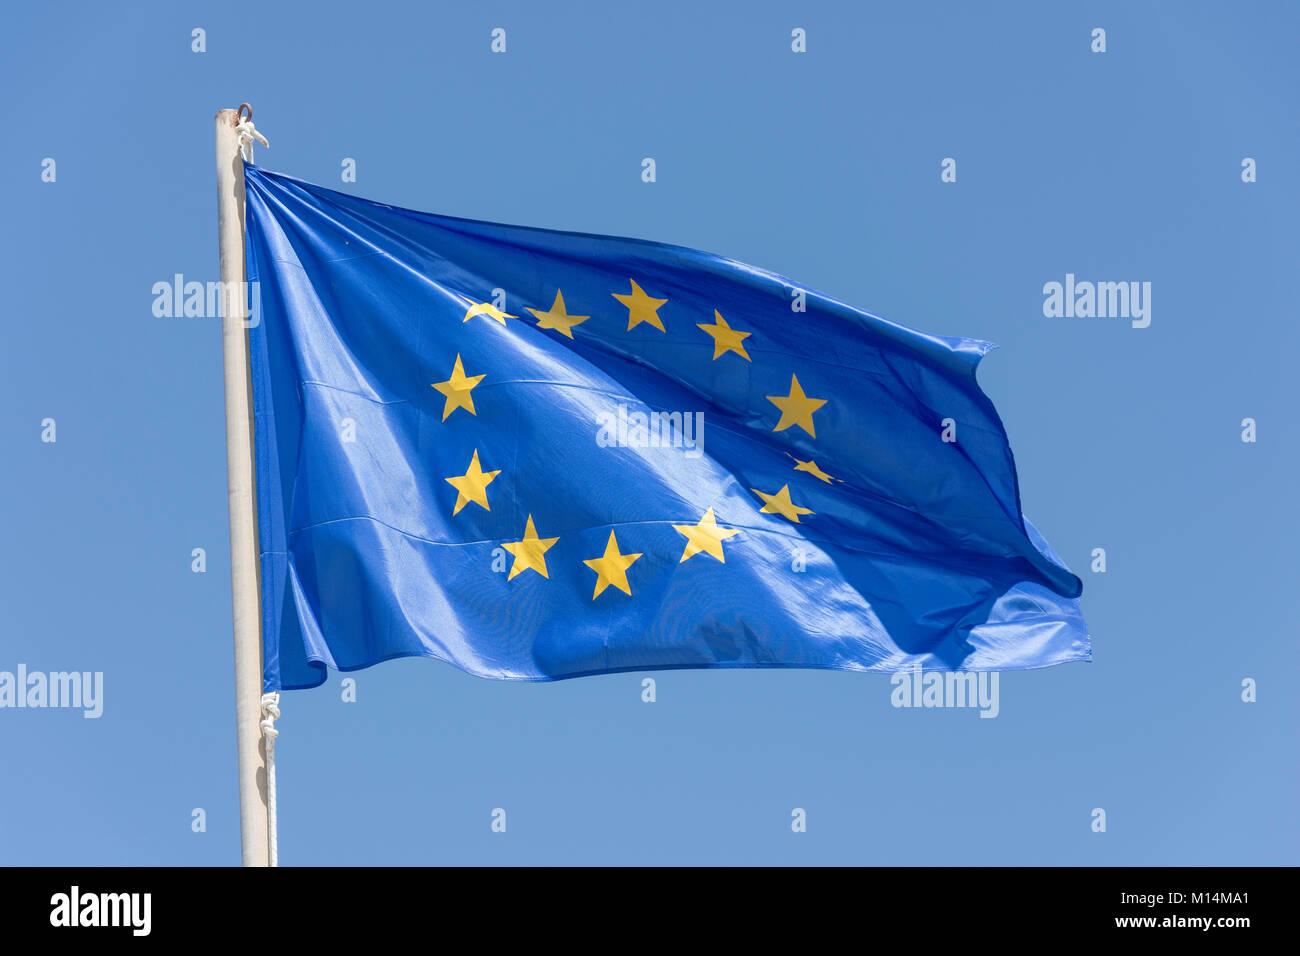 European Union flag (Flag of Europe), Ikarus Beach, Ikarus Beach, Rethymnon (Rethimno), Rethimno Region, Crete (Kriti), - Stock Image